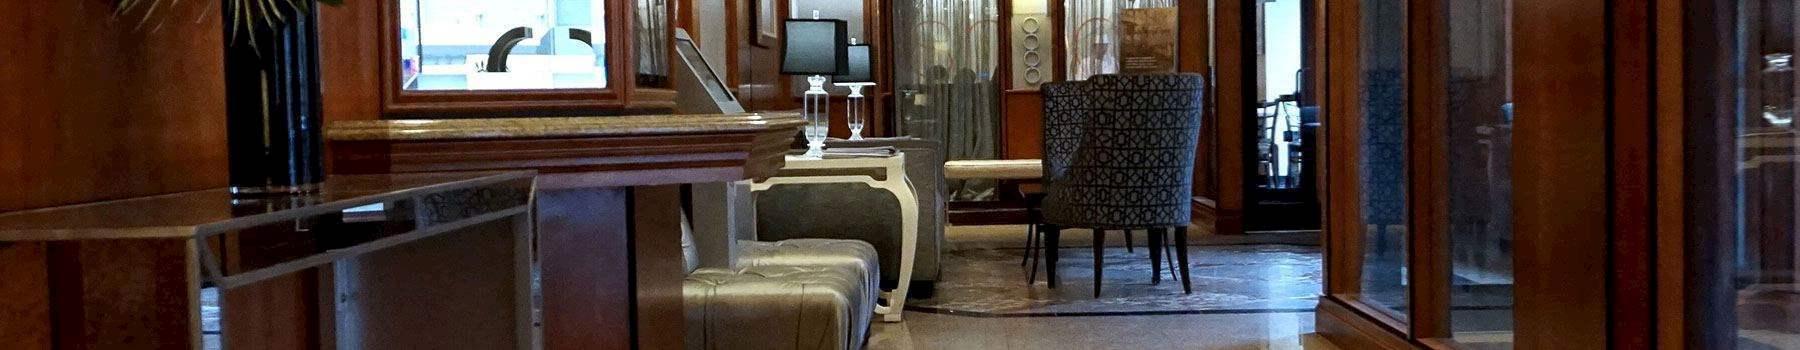 WJ Hotel-New York